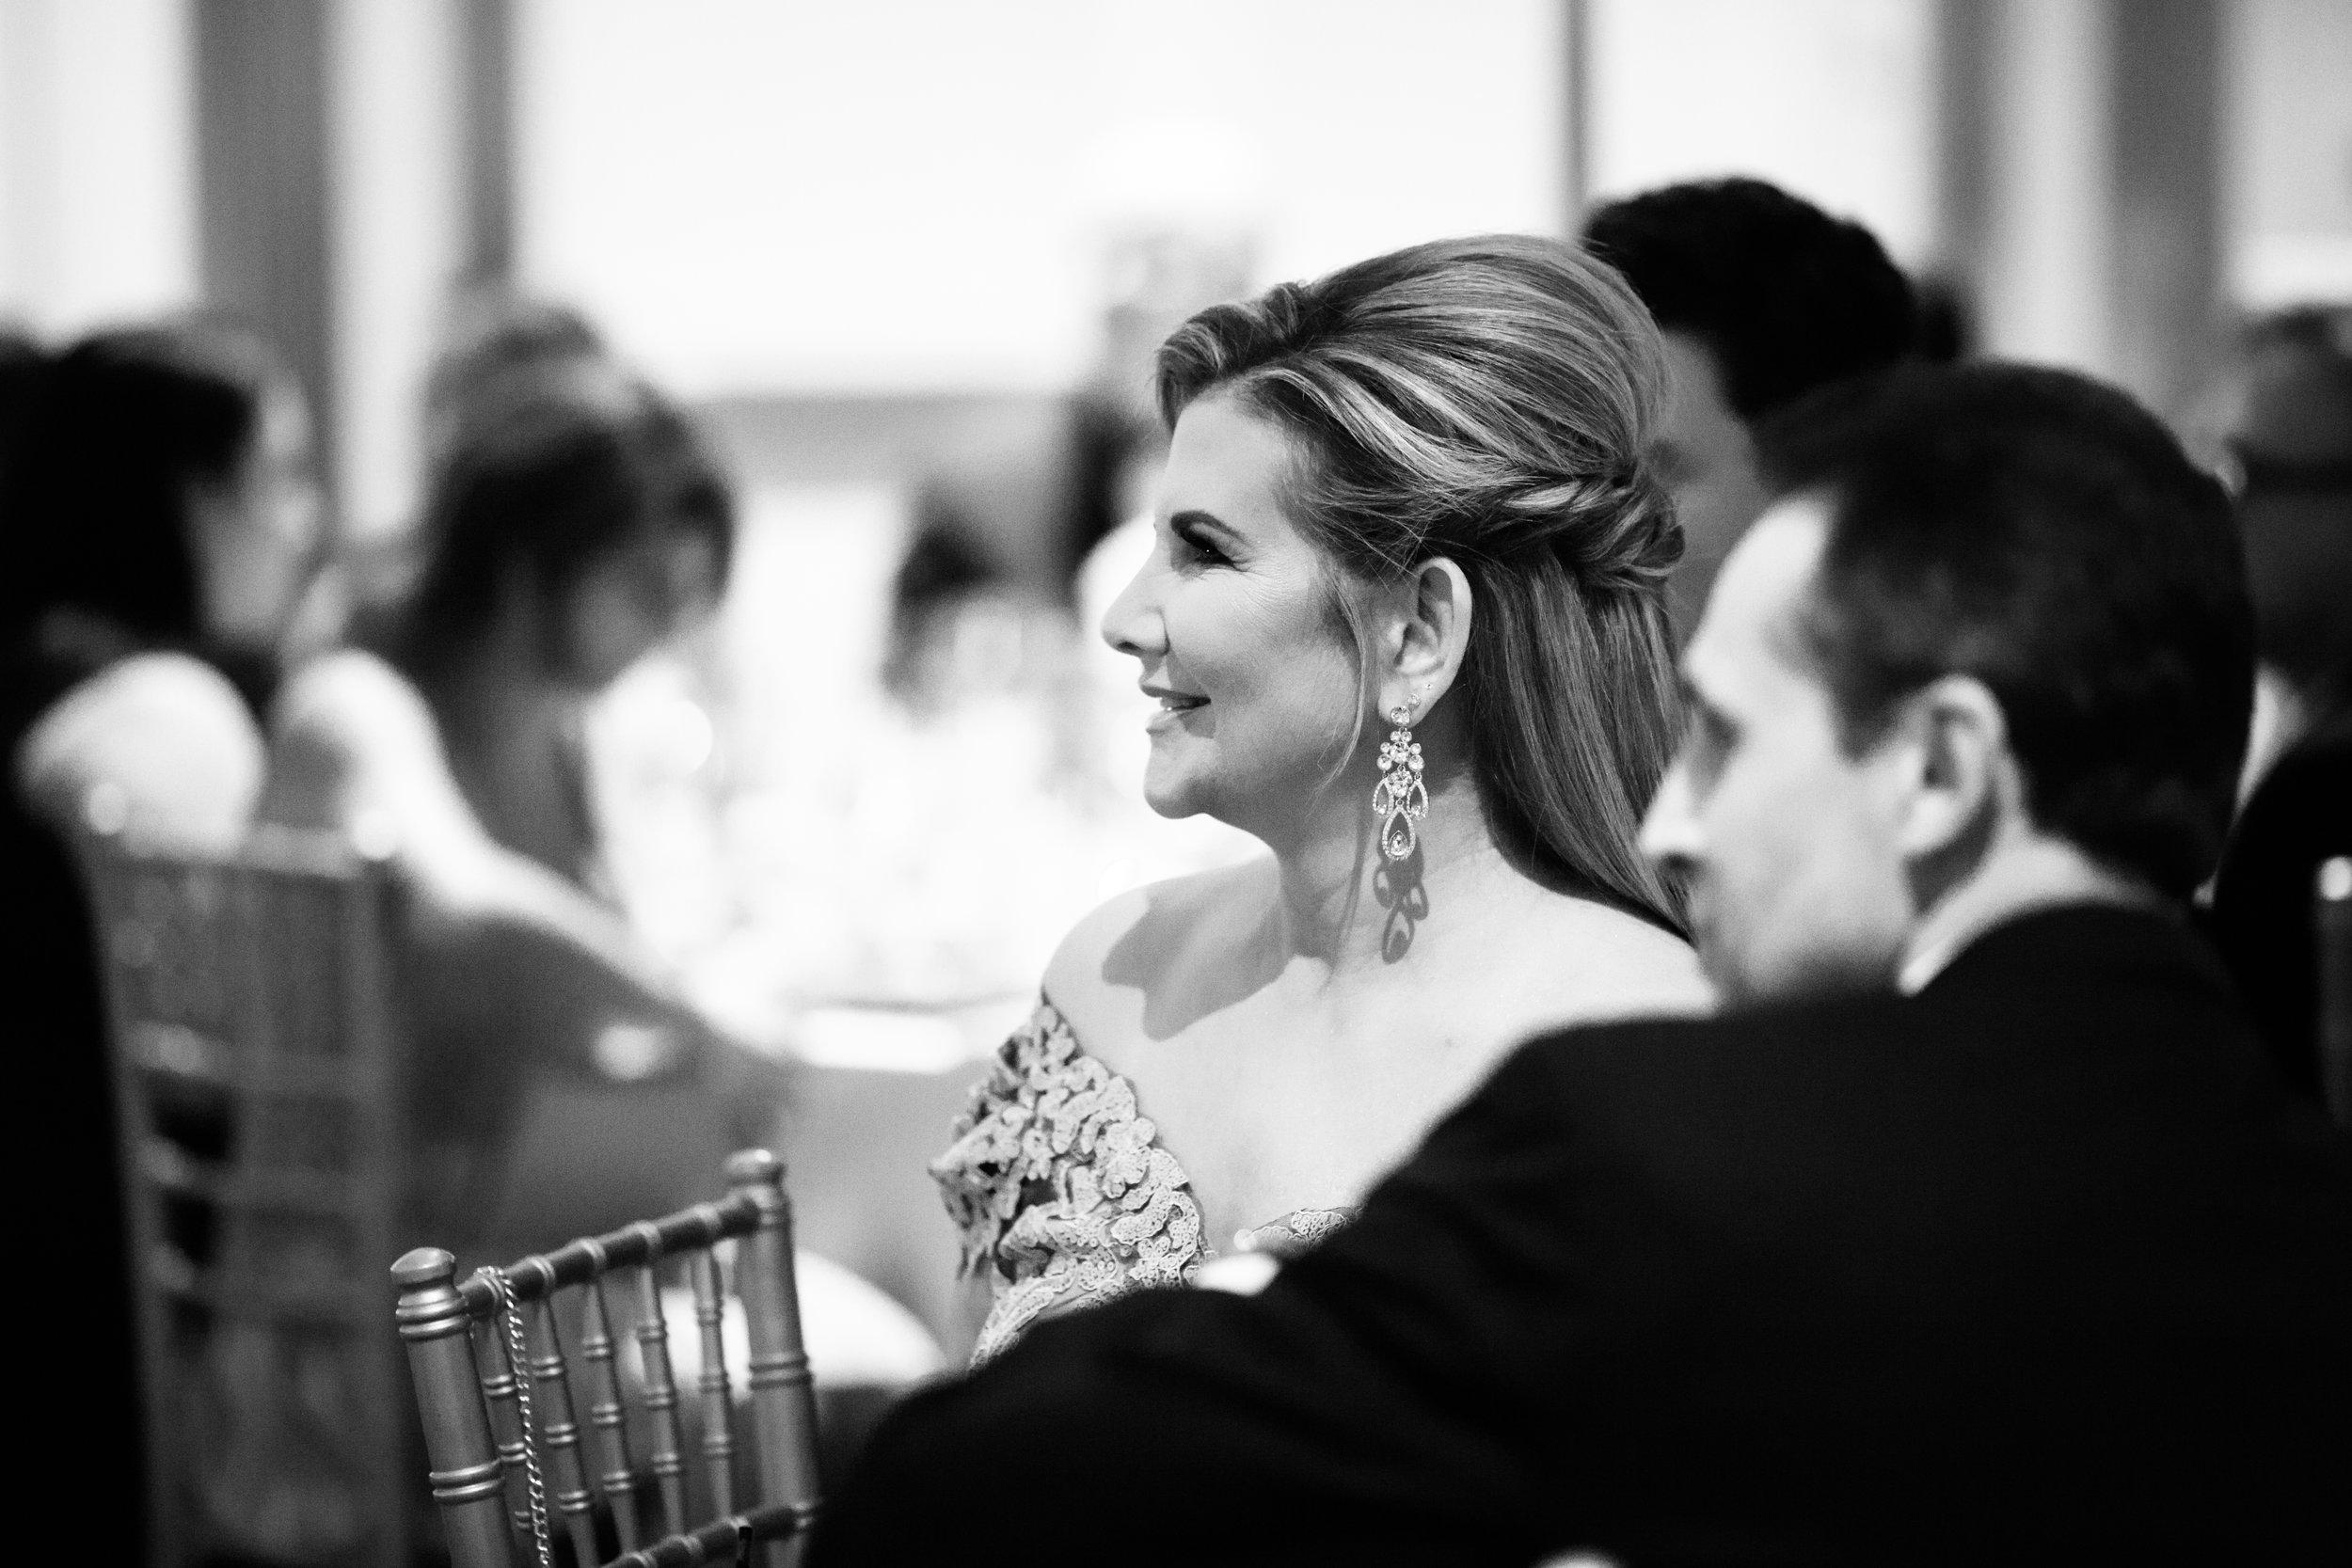 Elegant wedding at the JW Marriott Chicago31.jpg